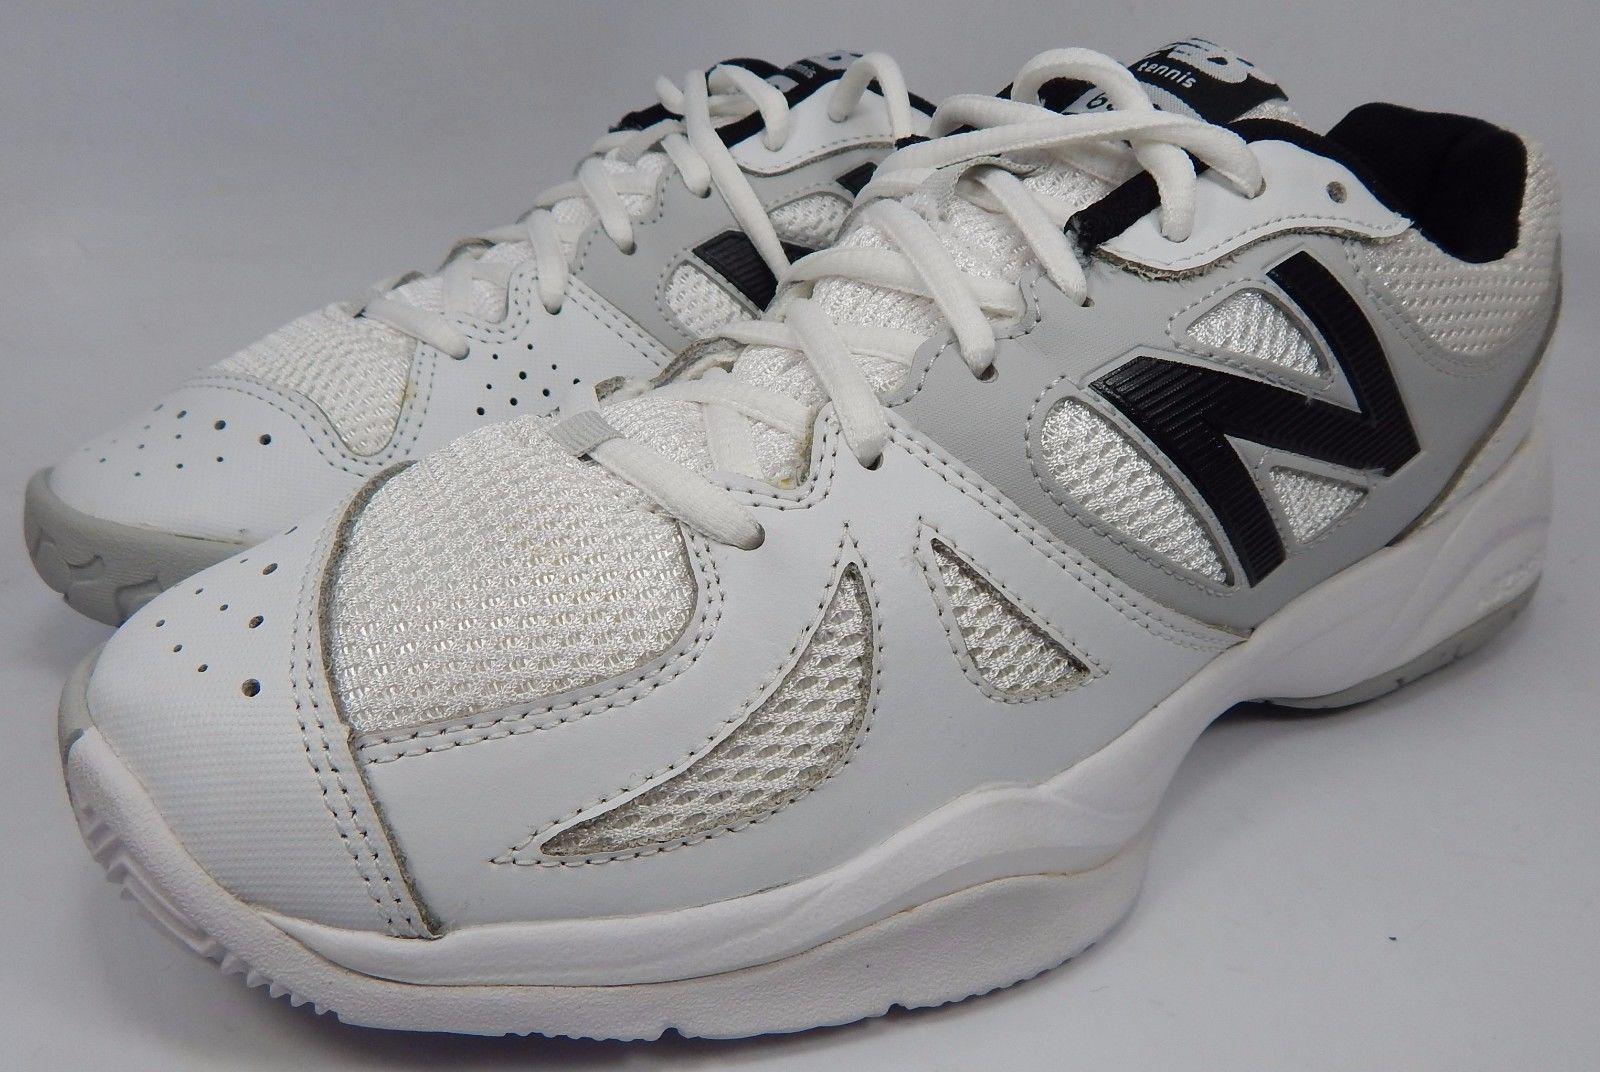 New Balance 696 Women's Tennis Court Shoes Size US 11 M (B) EU 43 White WC696WS